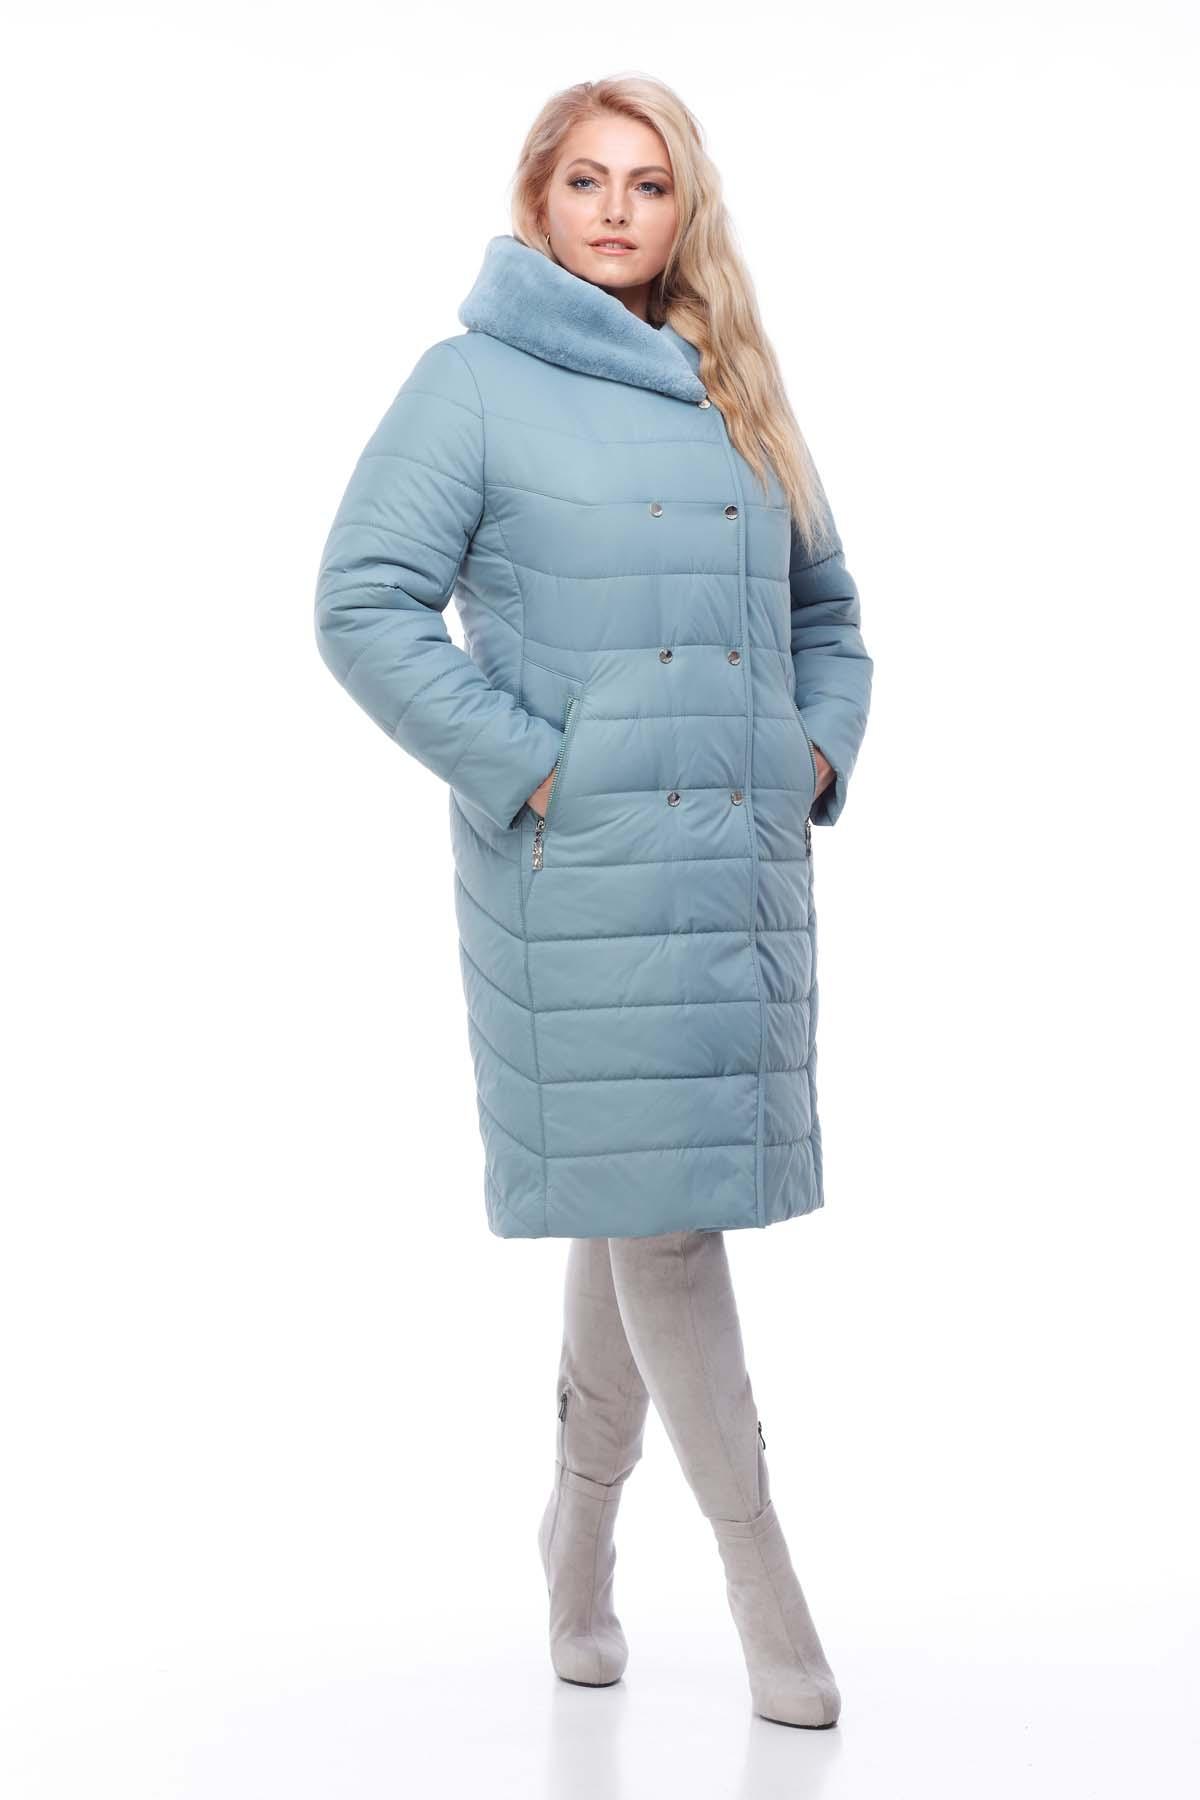 aa522f836ac Зимнее пальто Ким кролик Зима аквамарин